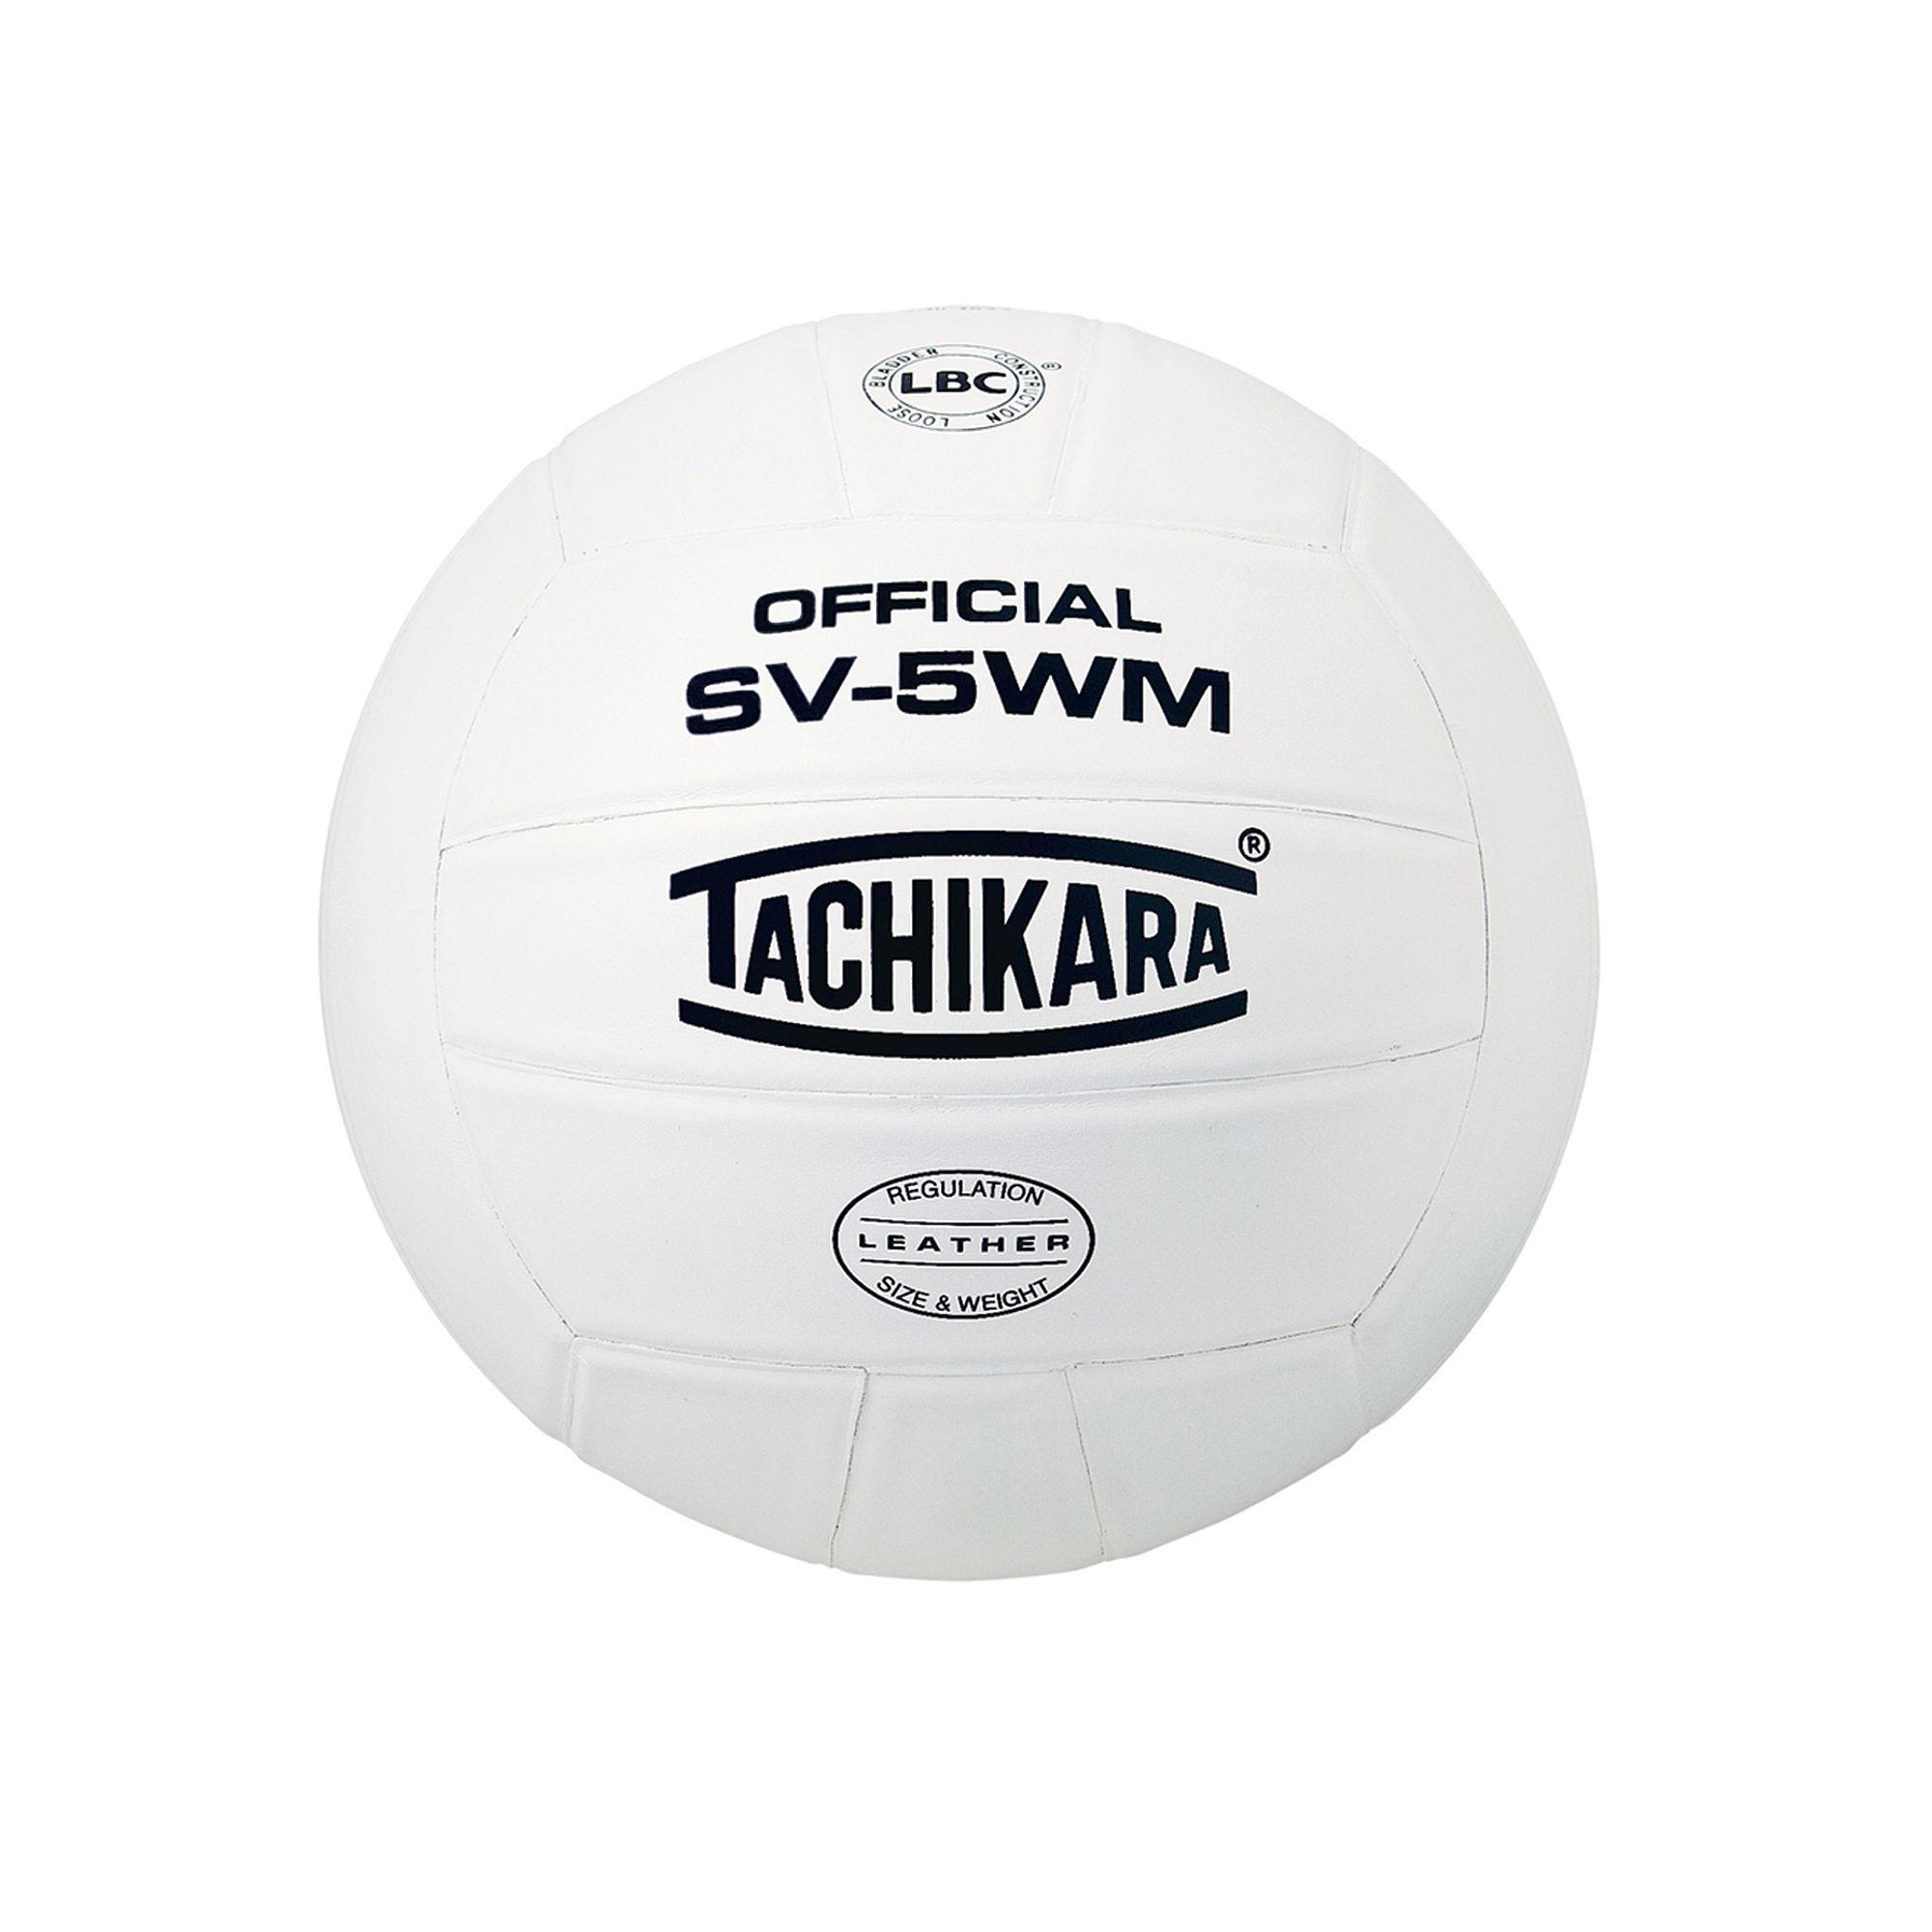 Tachikara Official Sv5wm Premium Leather Volleyball White Volleyballs Indoor Volleyball Volleyball Set